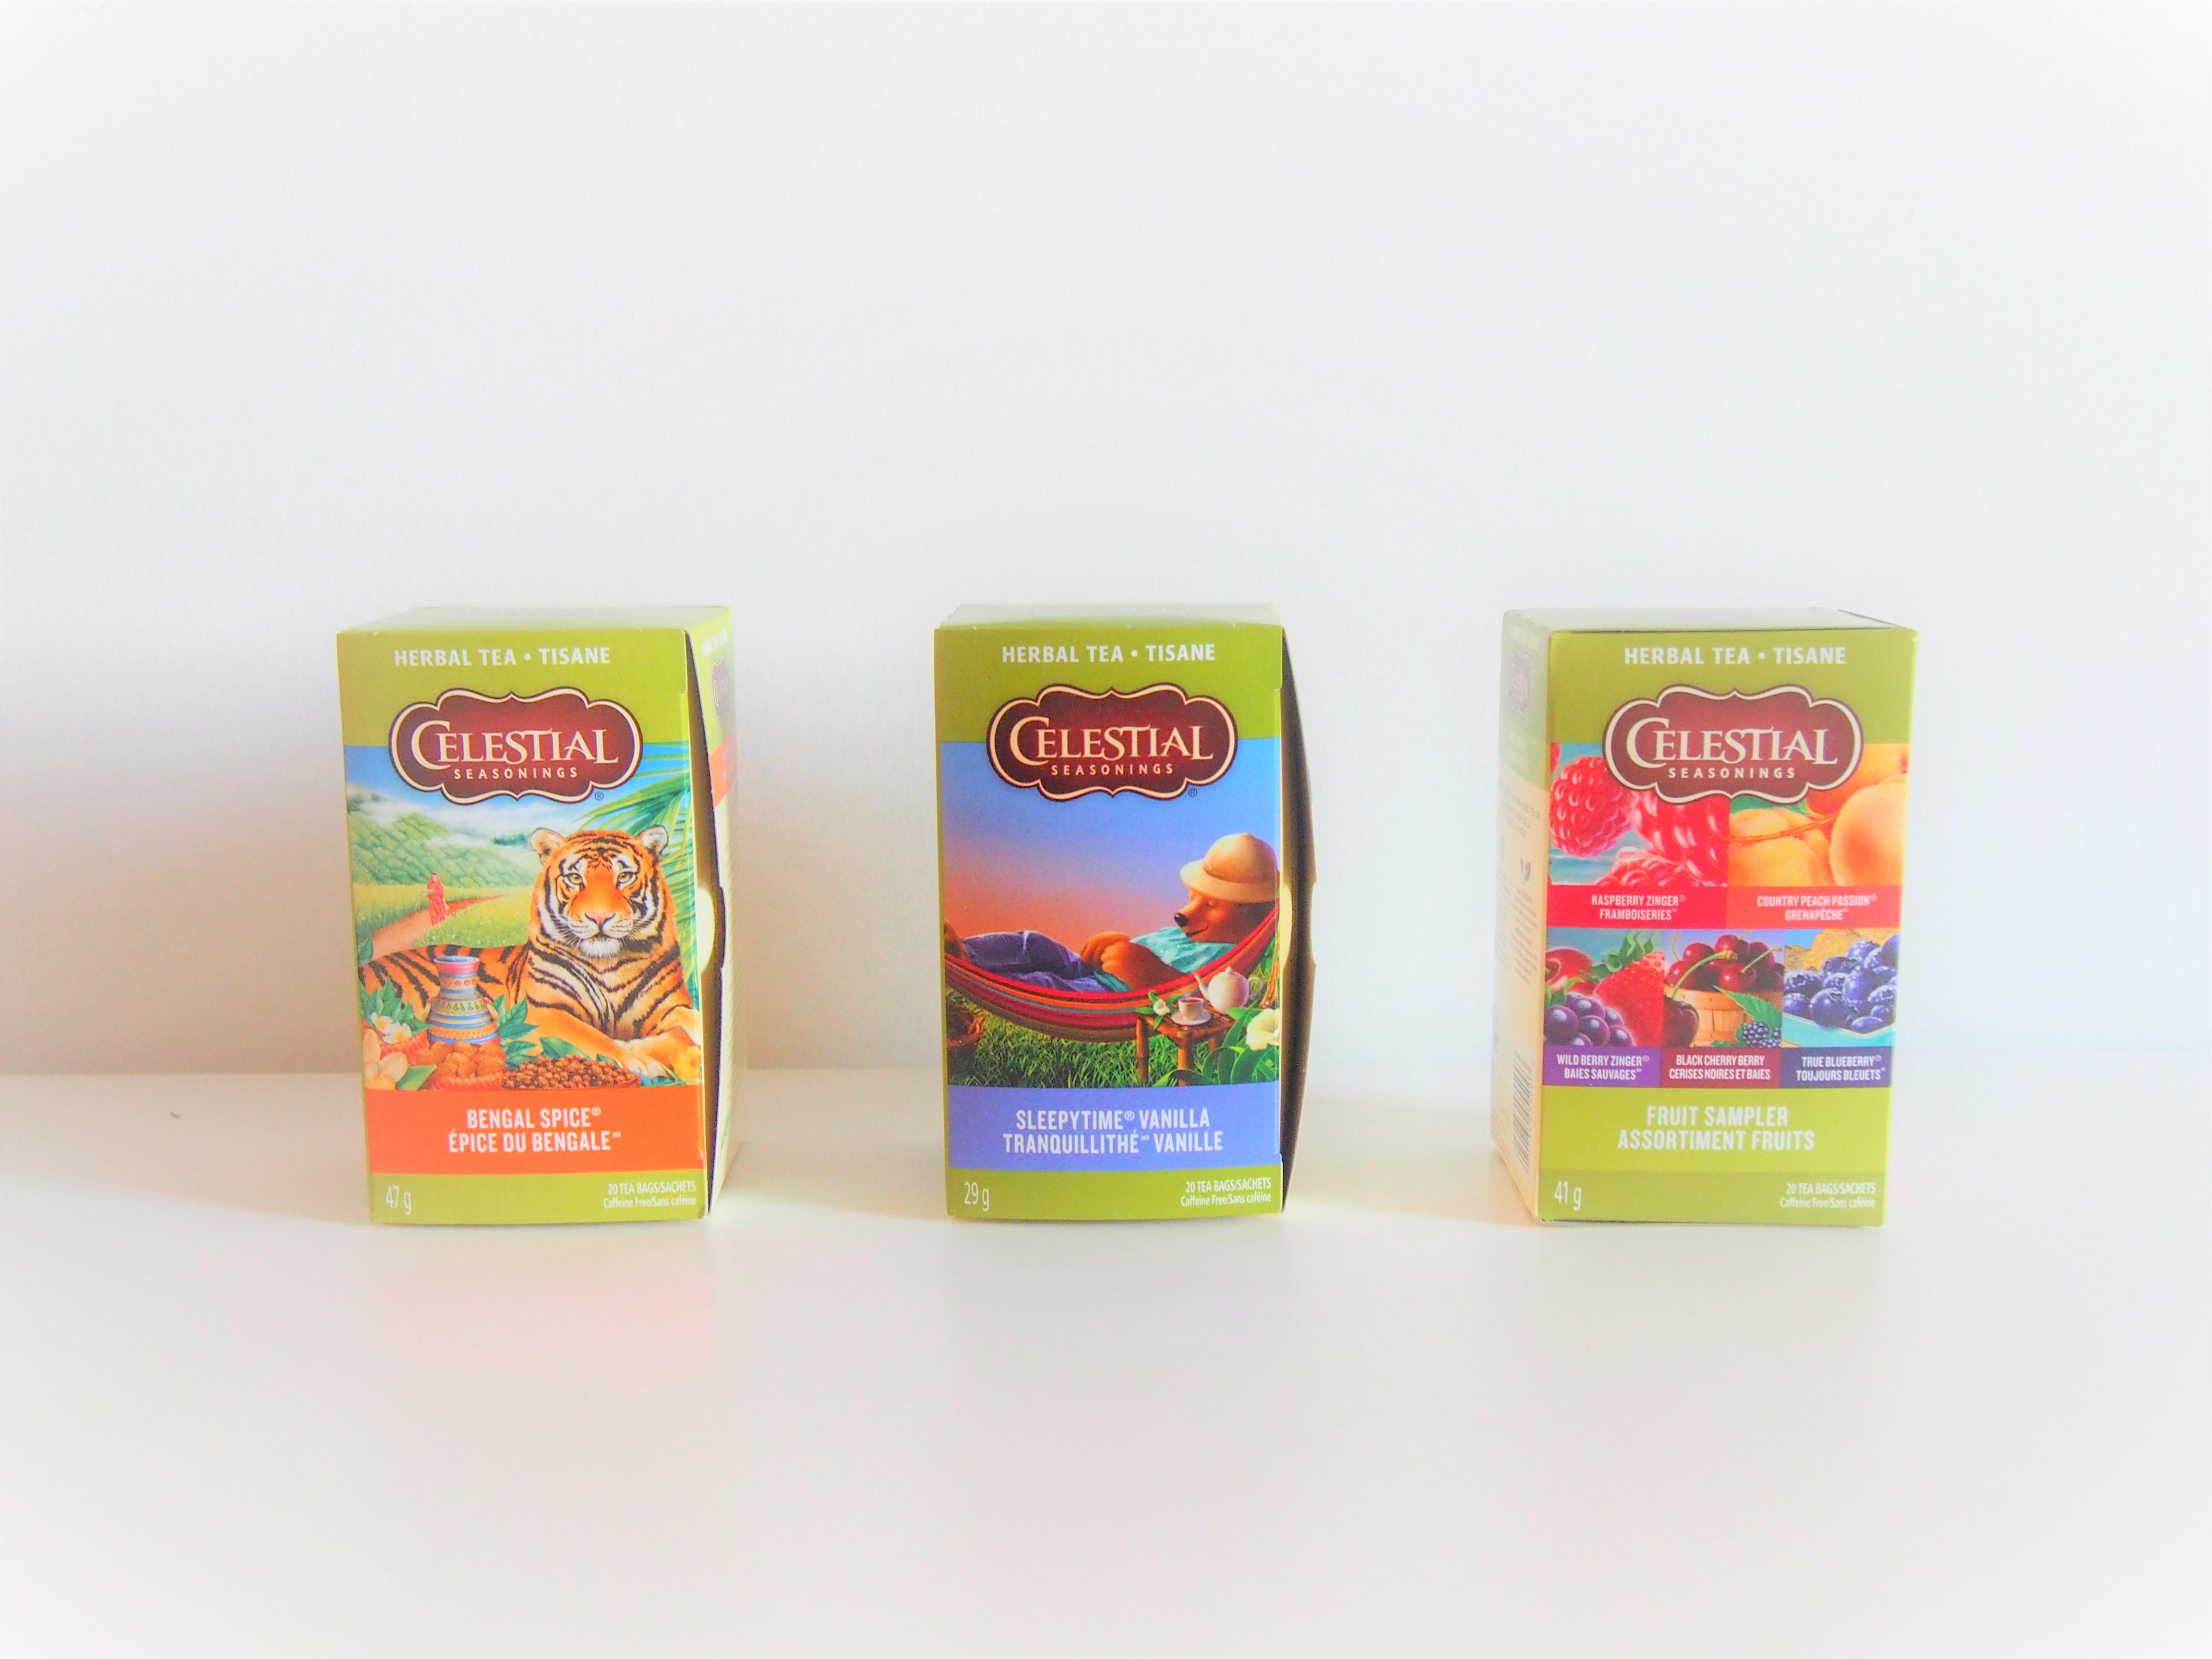 Celestial Seasonings Tea Box Art Designs